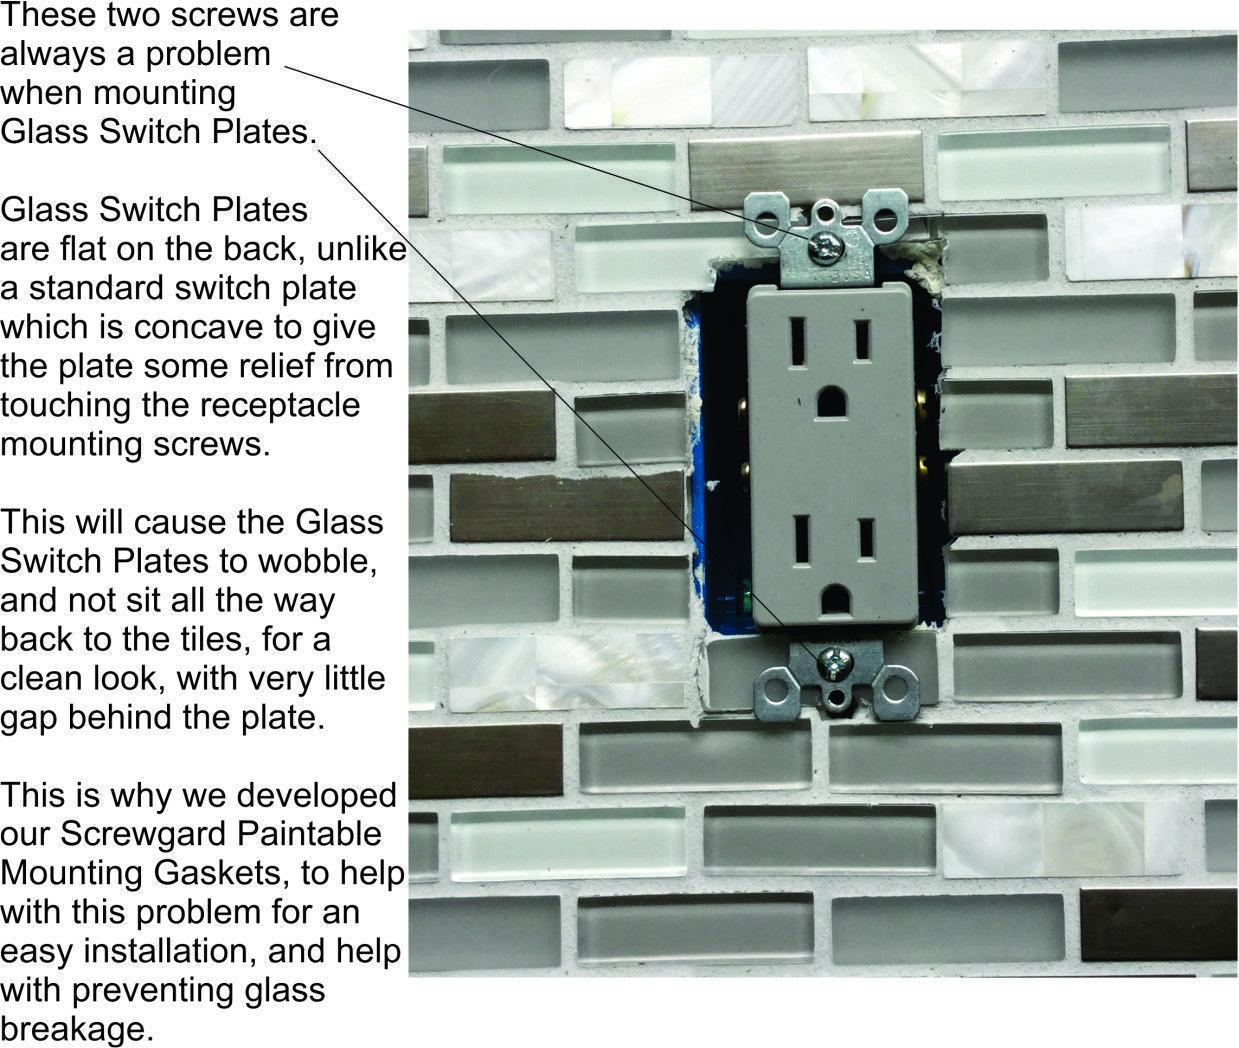 beveled glass switch plates